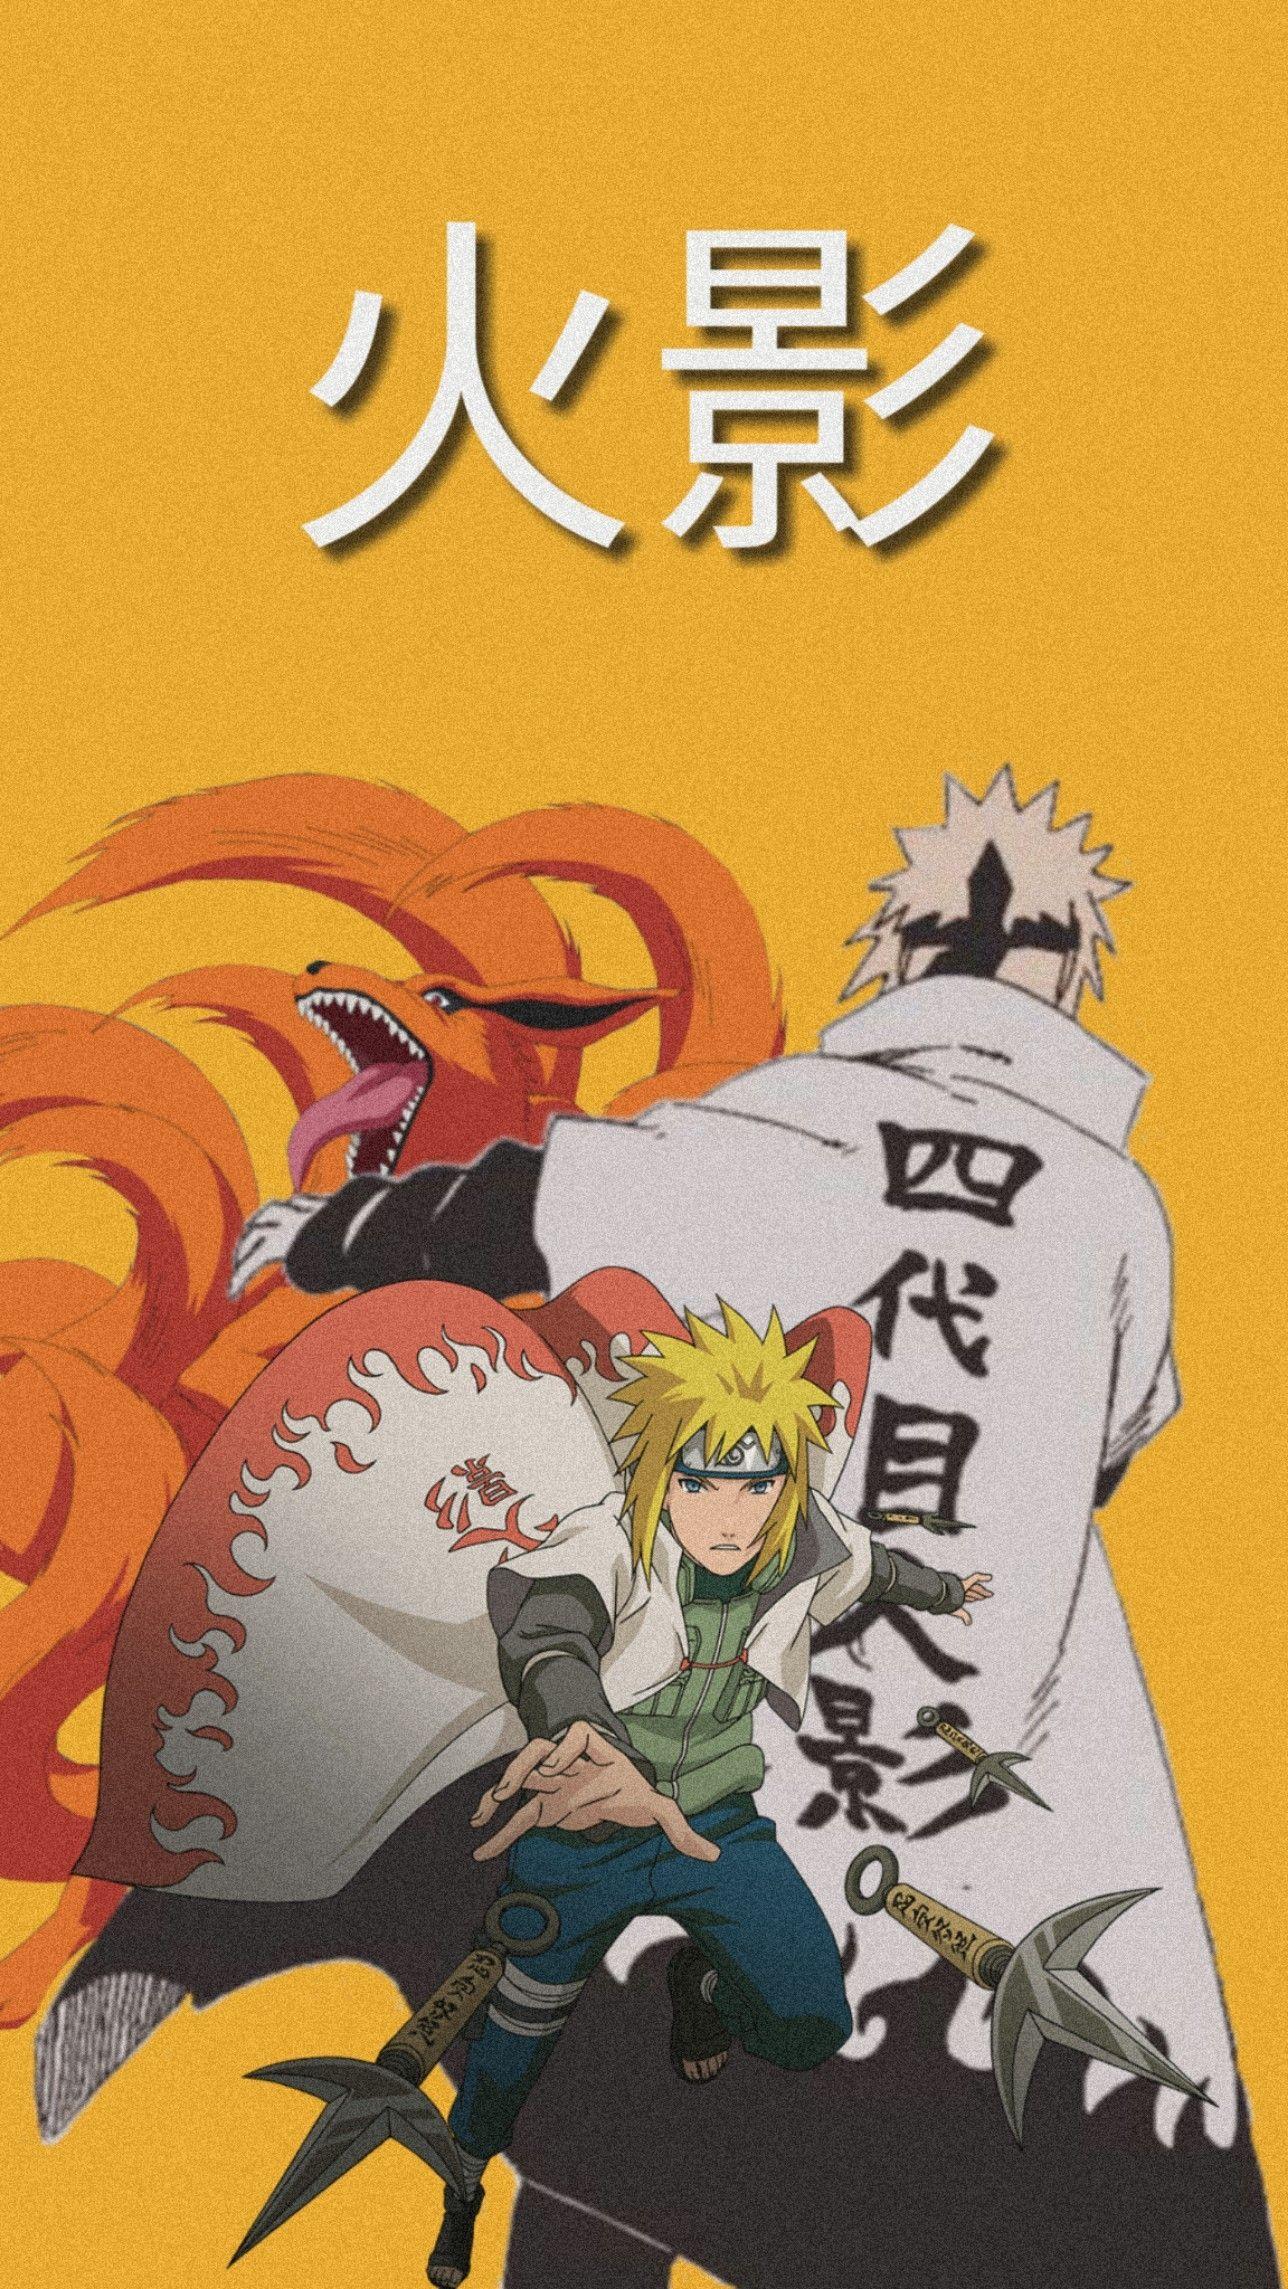 Minato Namikaze Wallpaper Samurai Anime Naruto Merchandise Naruto Wallpaper